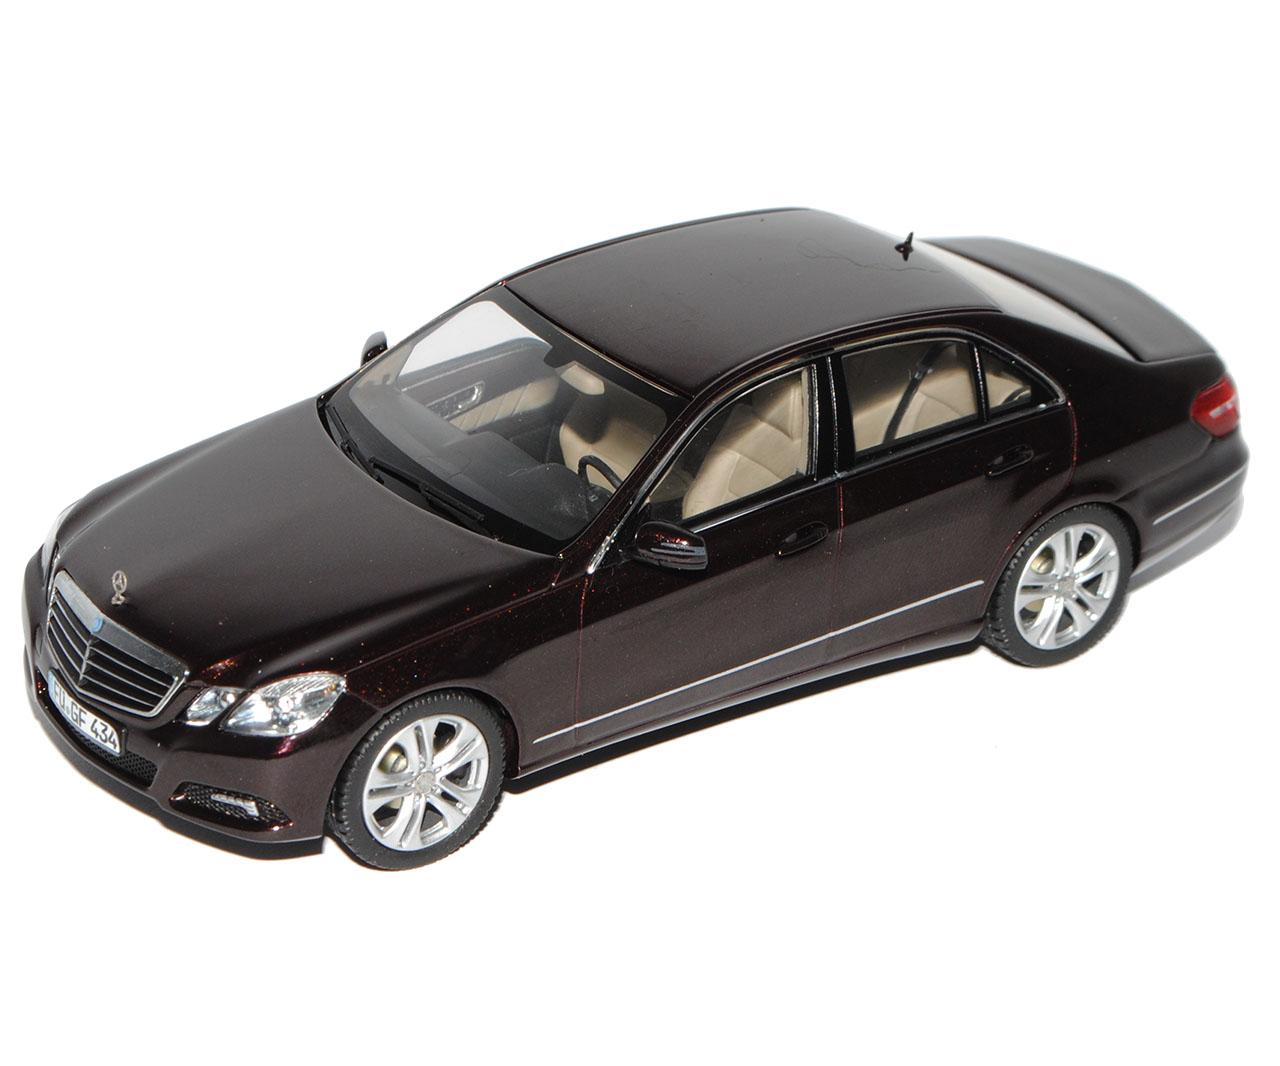 Mercedes-Benz Mercedes-Benz Mercedes-Benz E-class W212 limusina vanguardista negro pre cirugía estética Mon. 878315